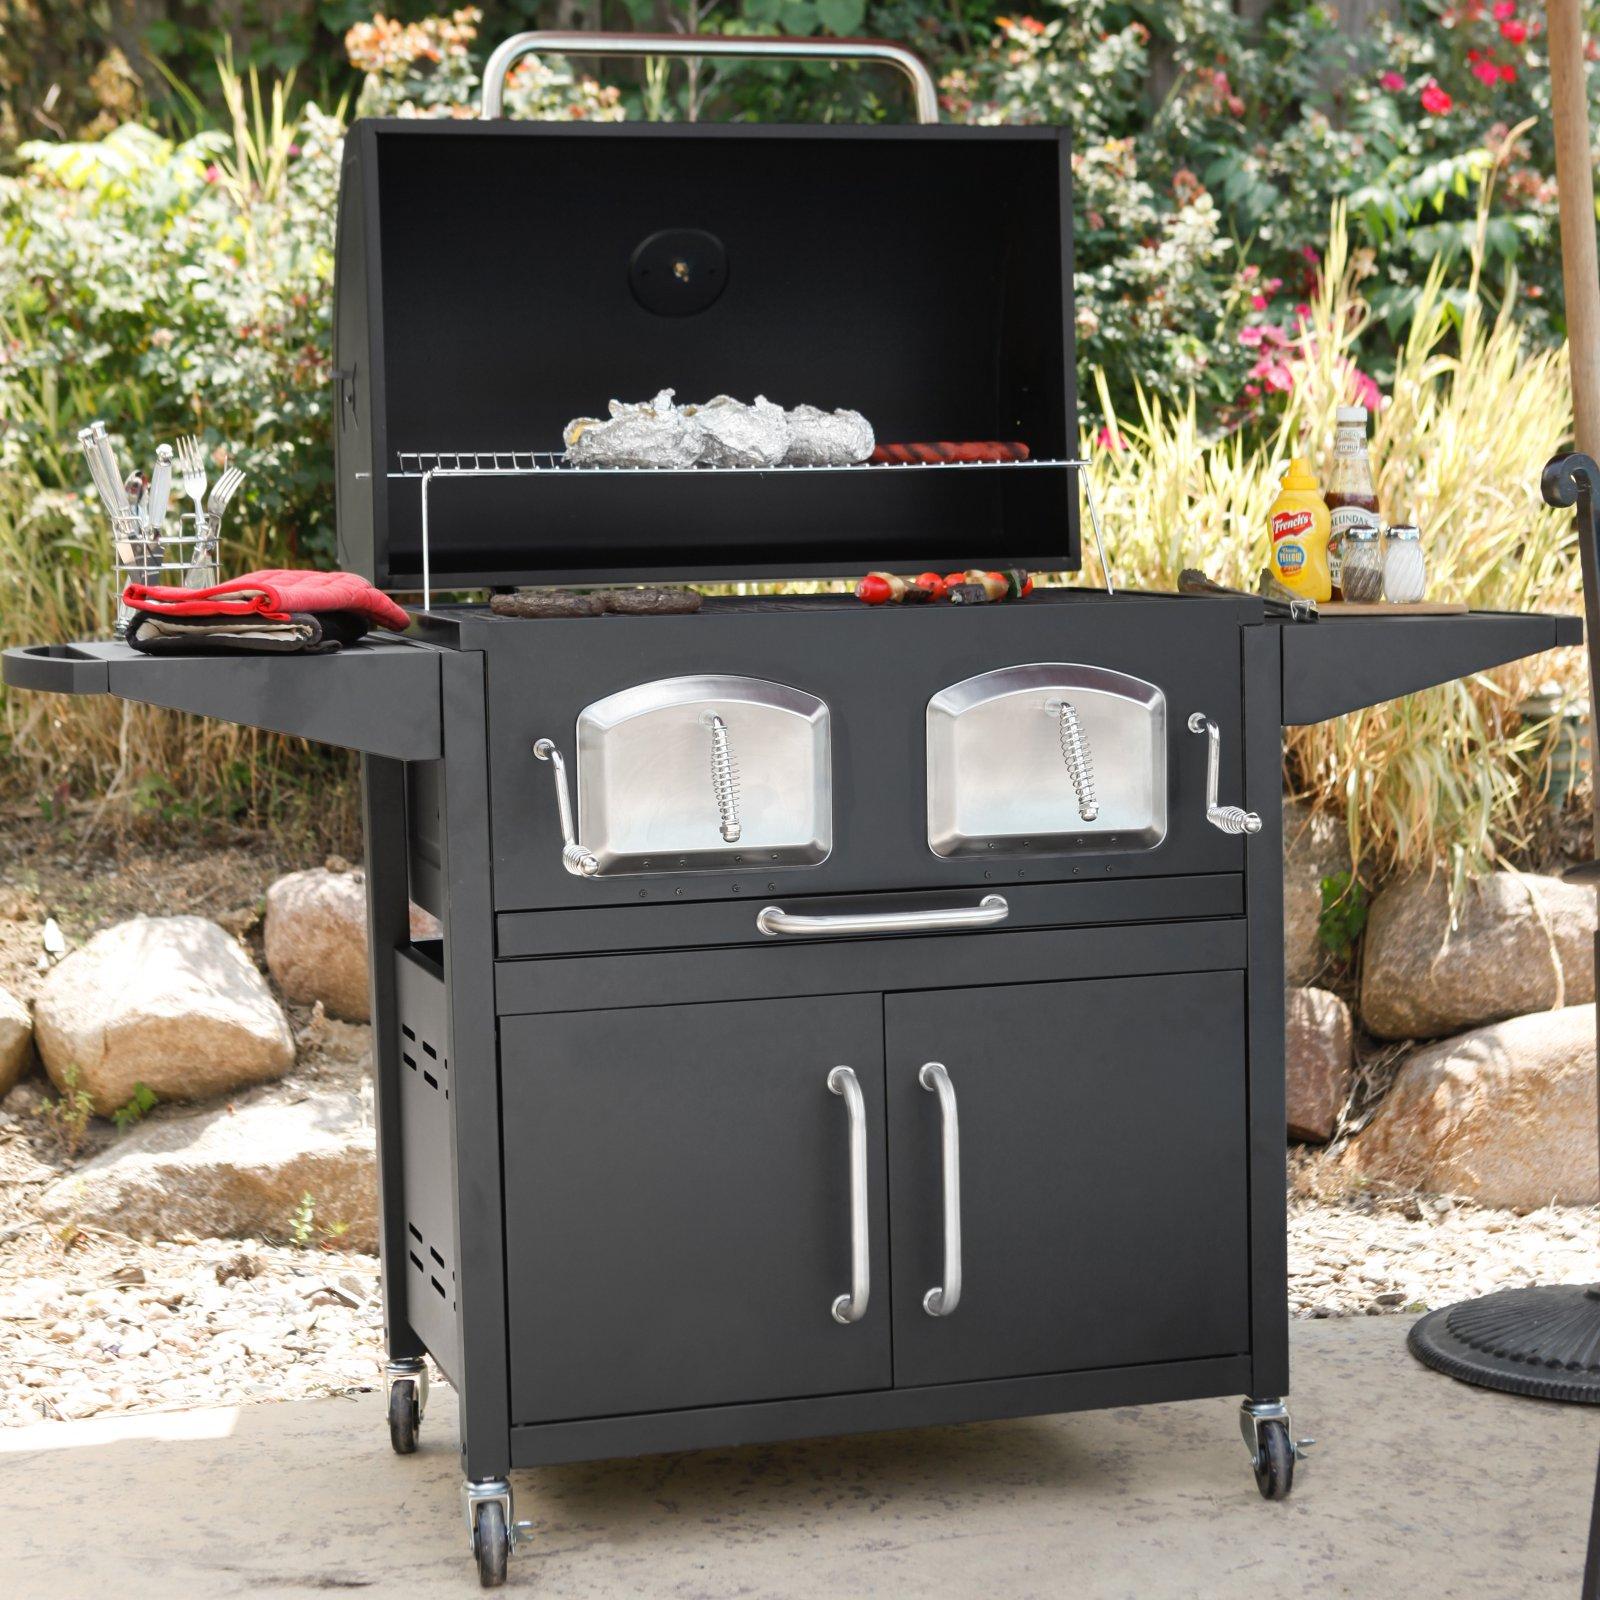 Landmann Smoky Mountain Bravo Premium Charcoal Grill